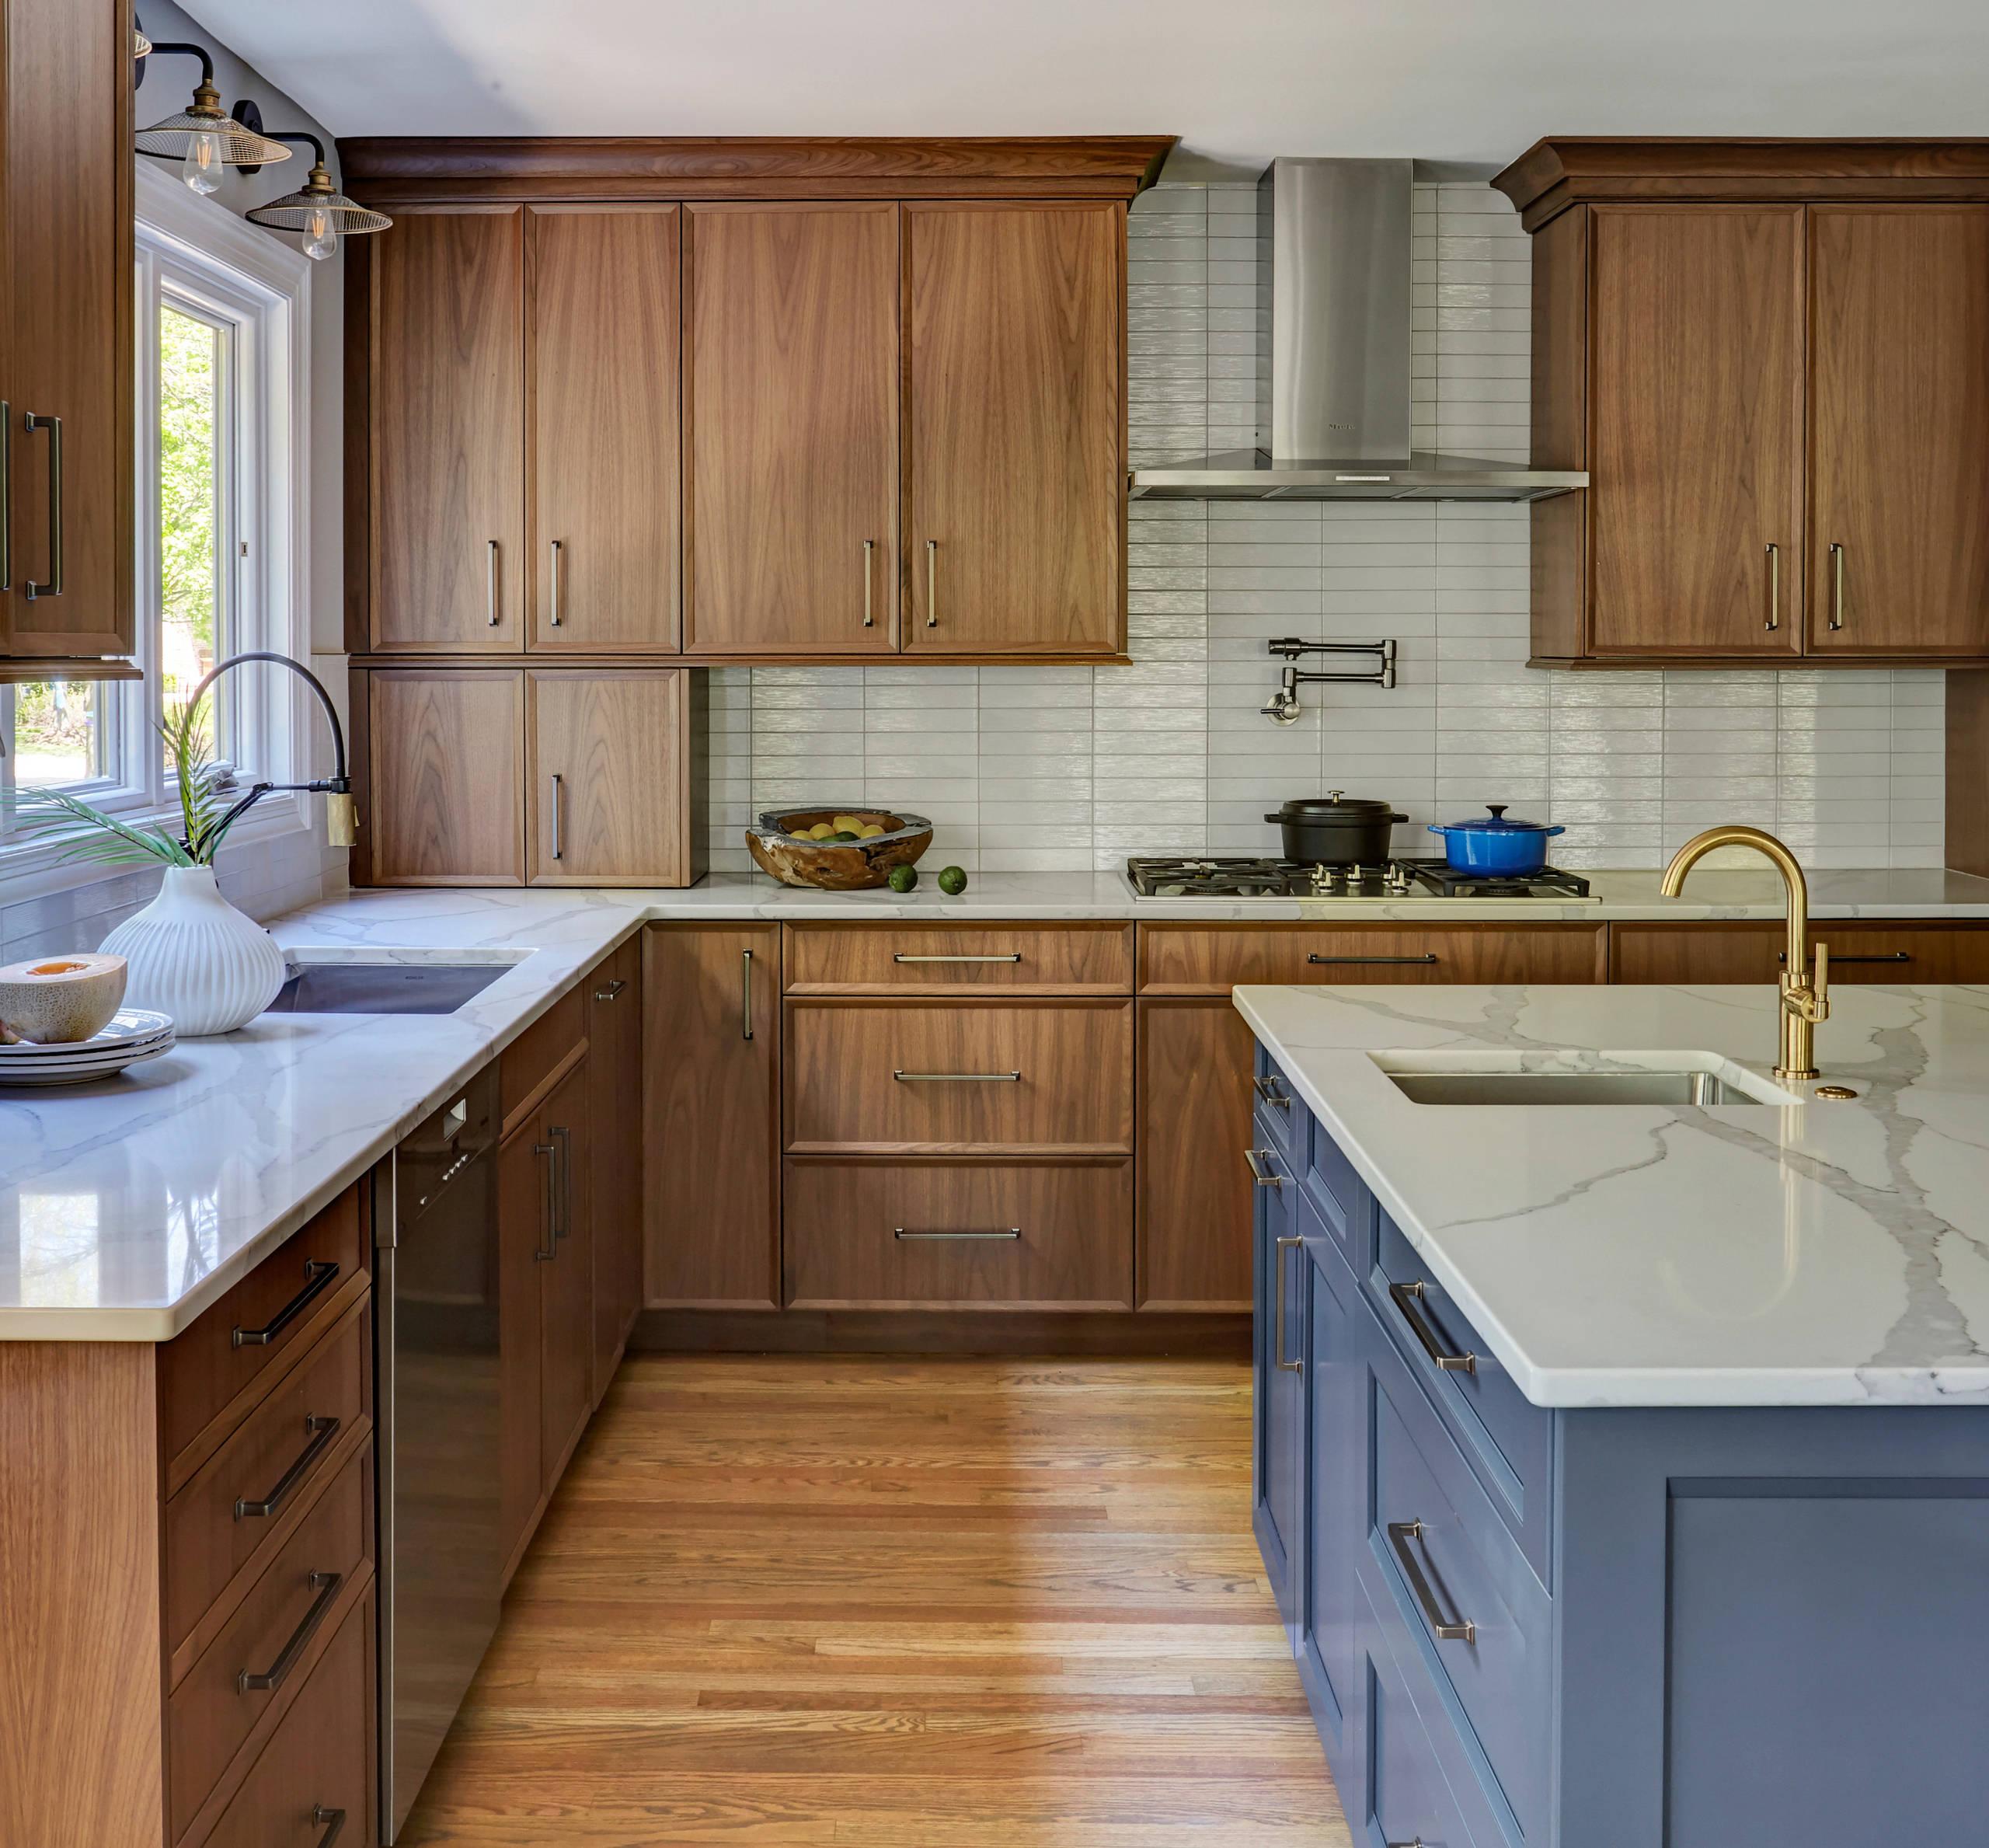 75 Beautiful Modern Open Concept Kitchen Pictures Ideas June 2021 Houzz